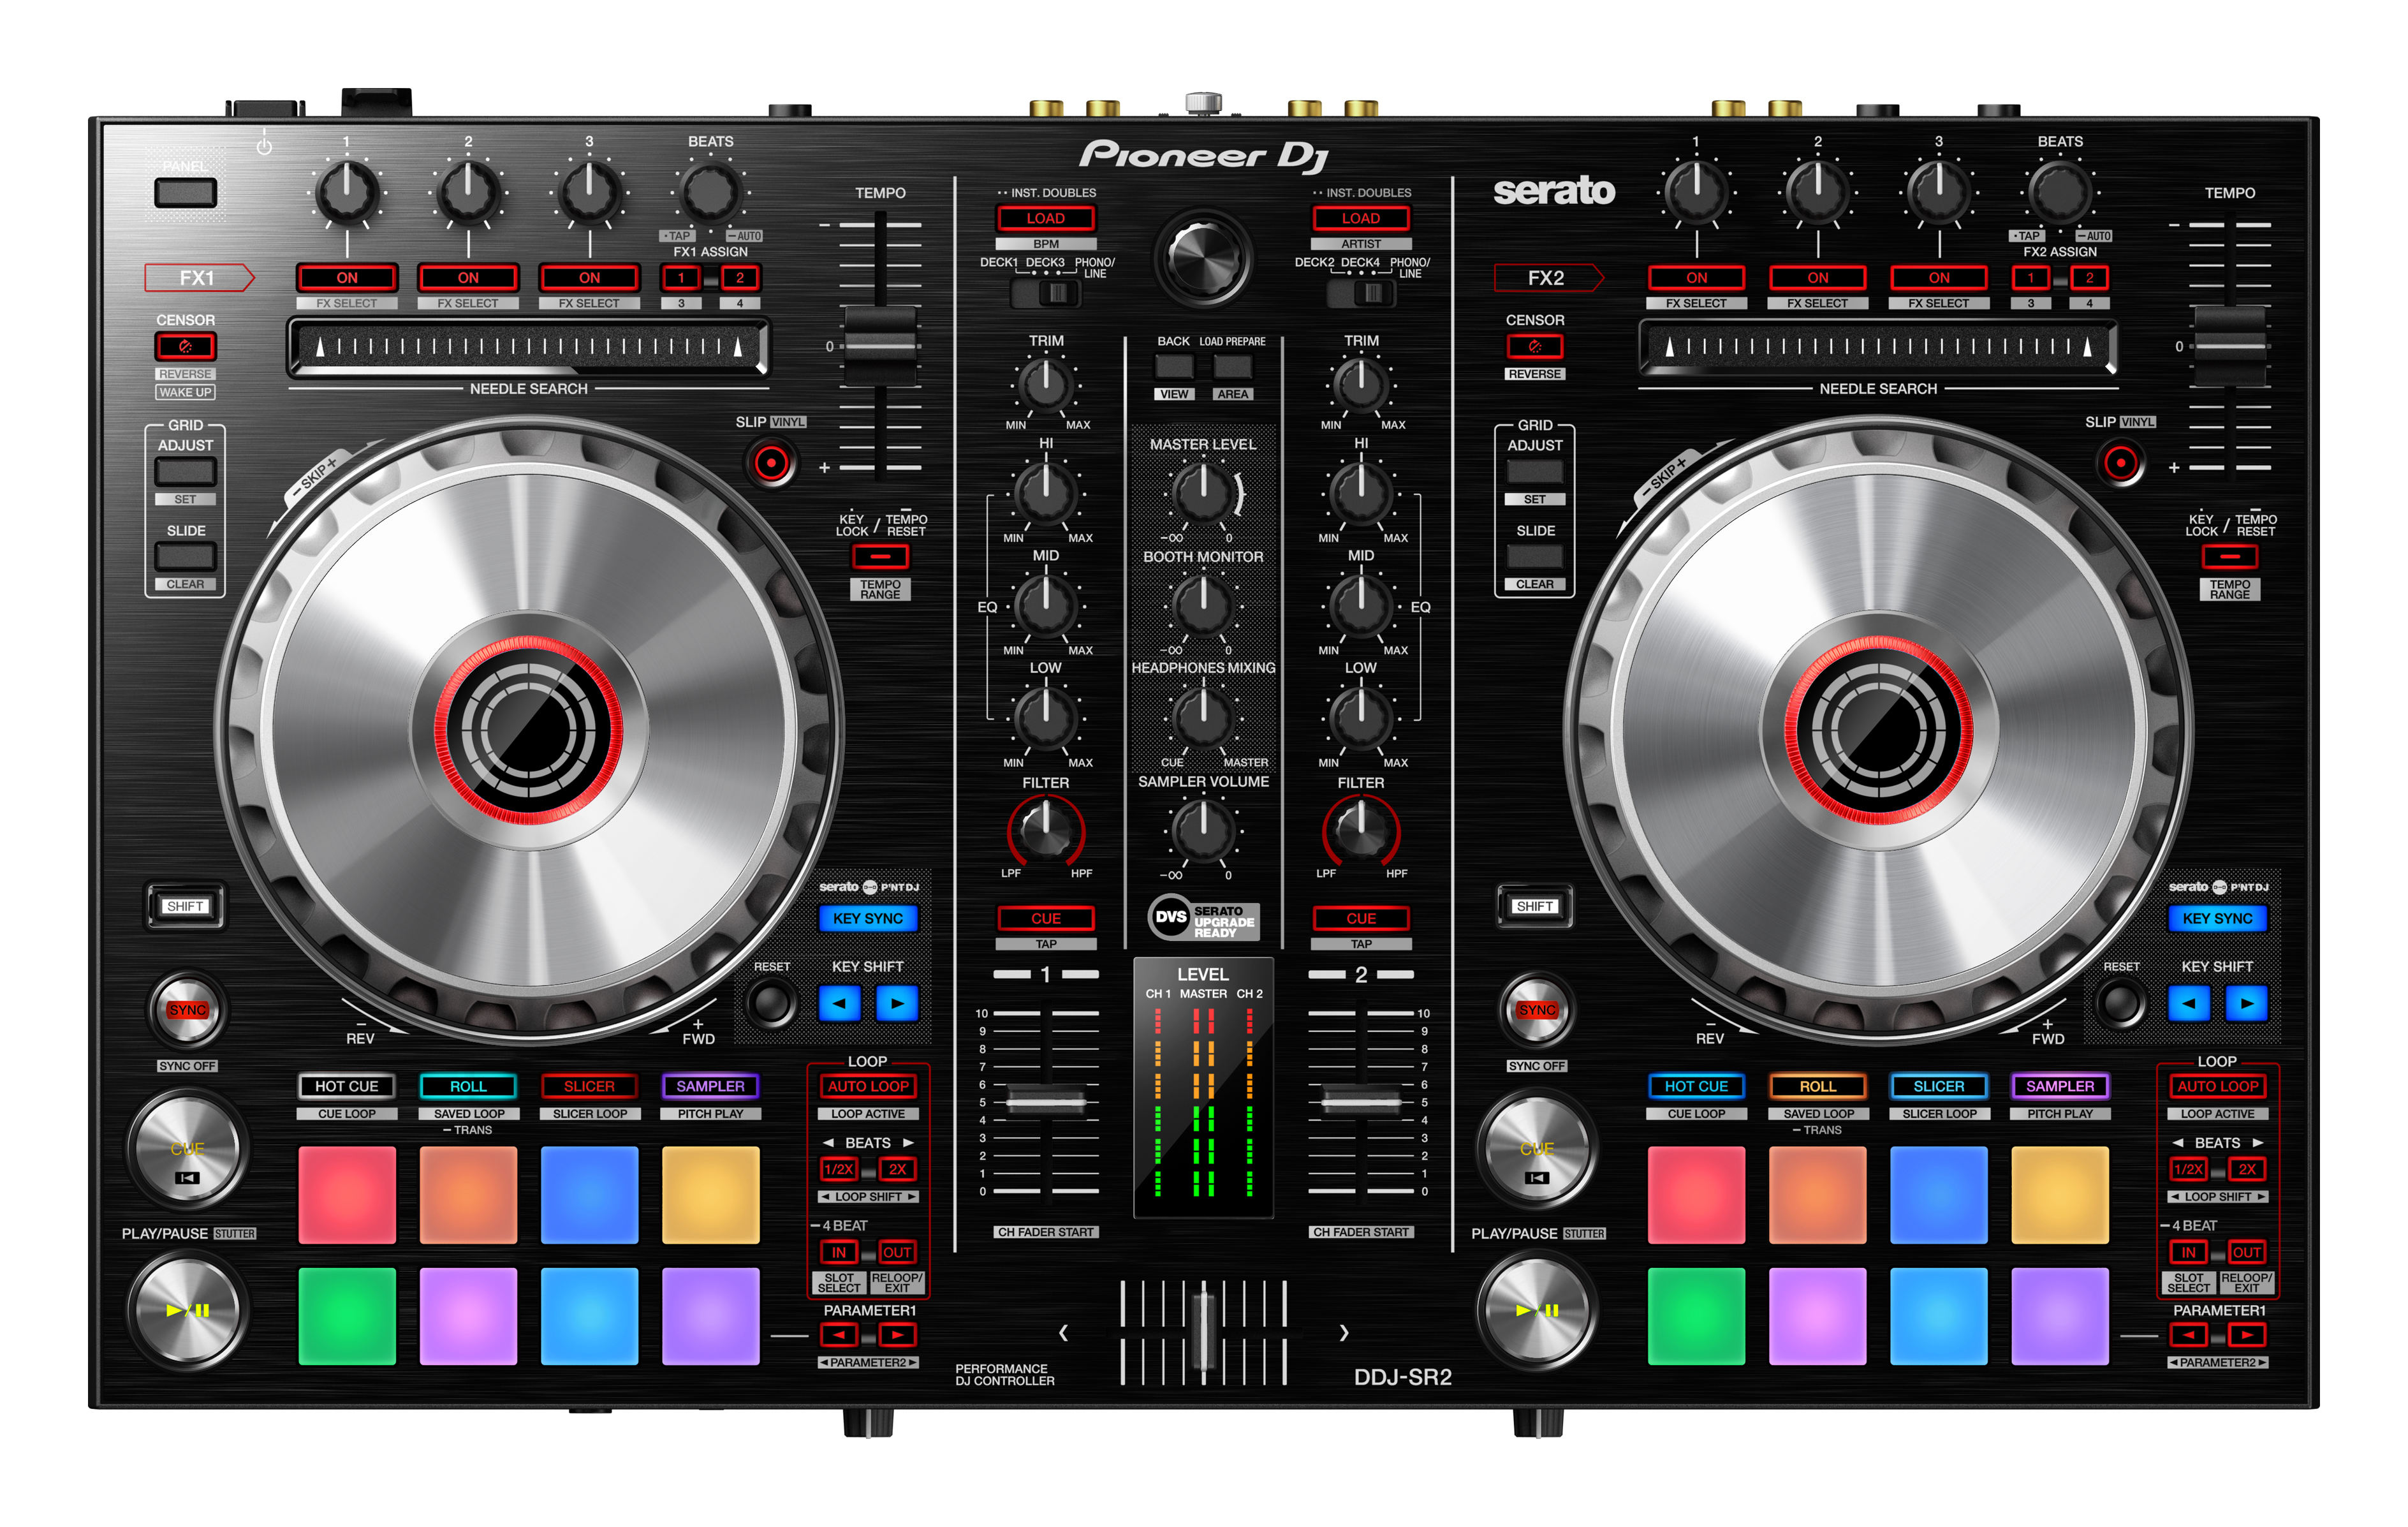 Serato DJ Equipment